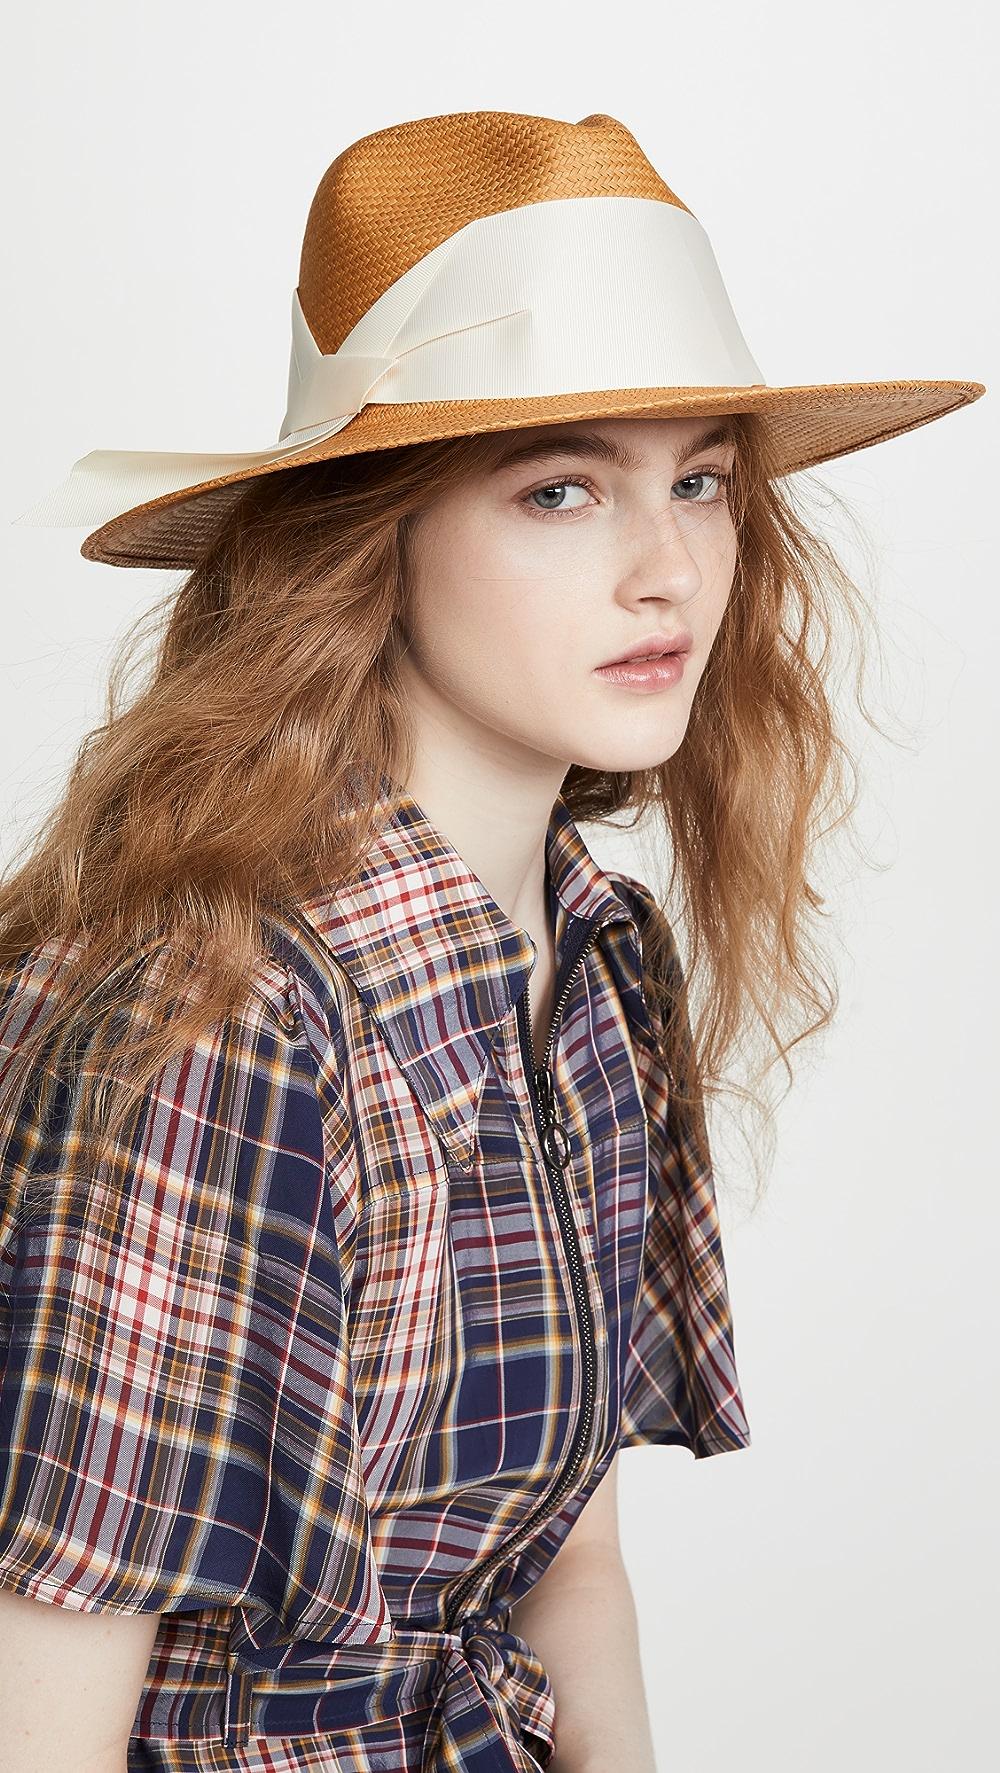 Dedicated Freya - The Gardenia Hat Aromatic Flavor